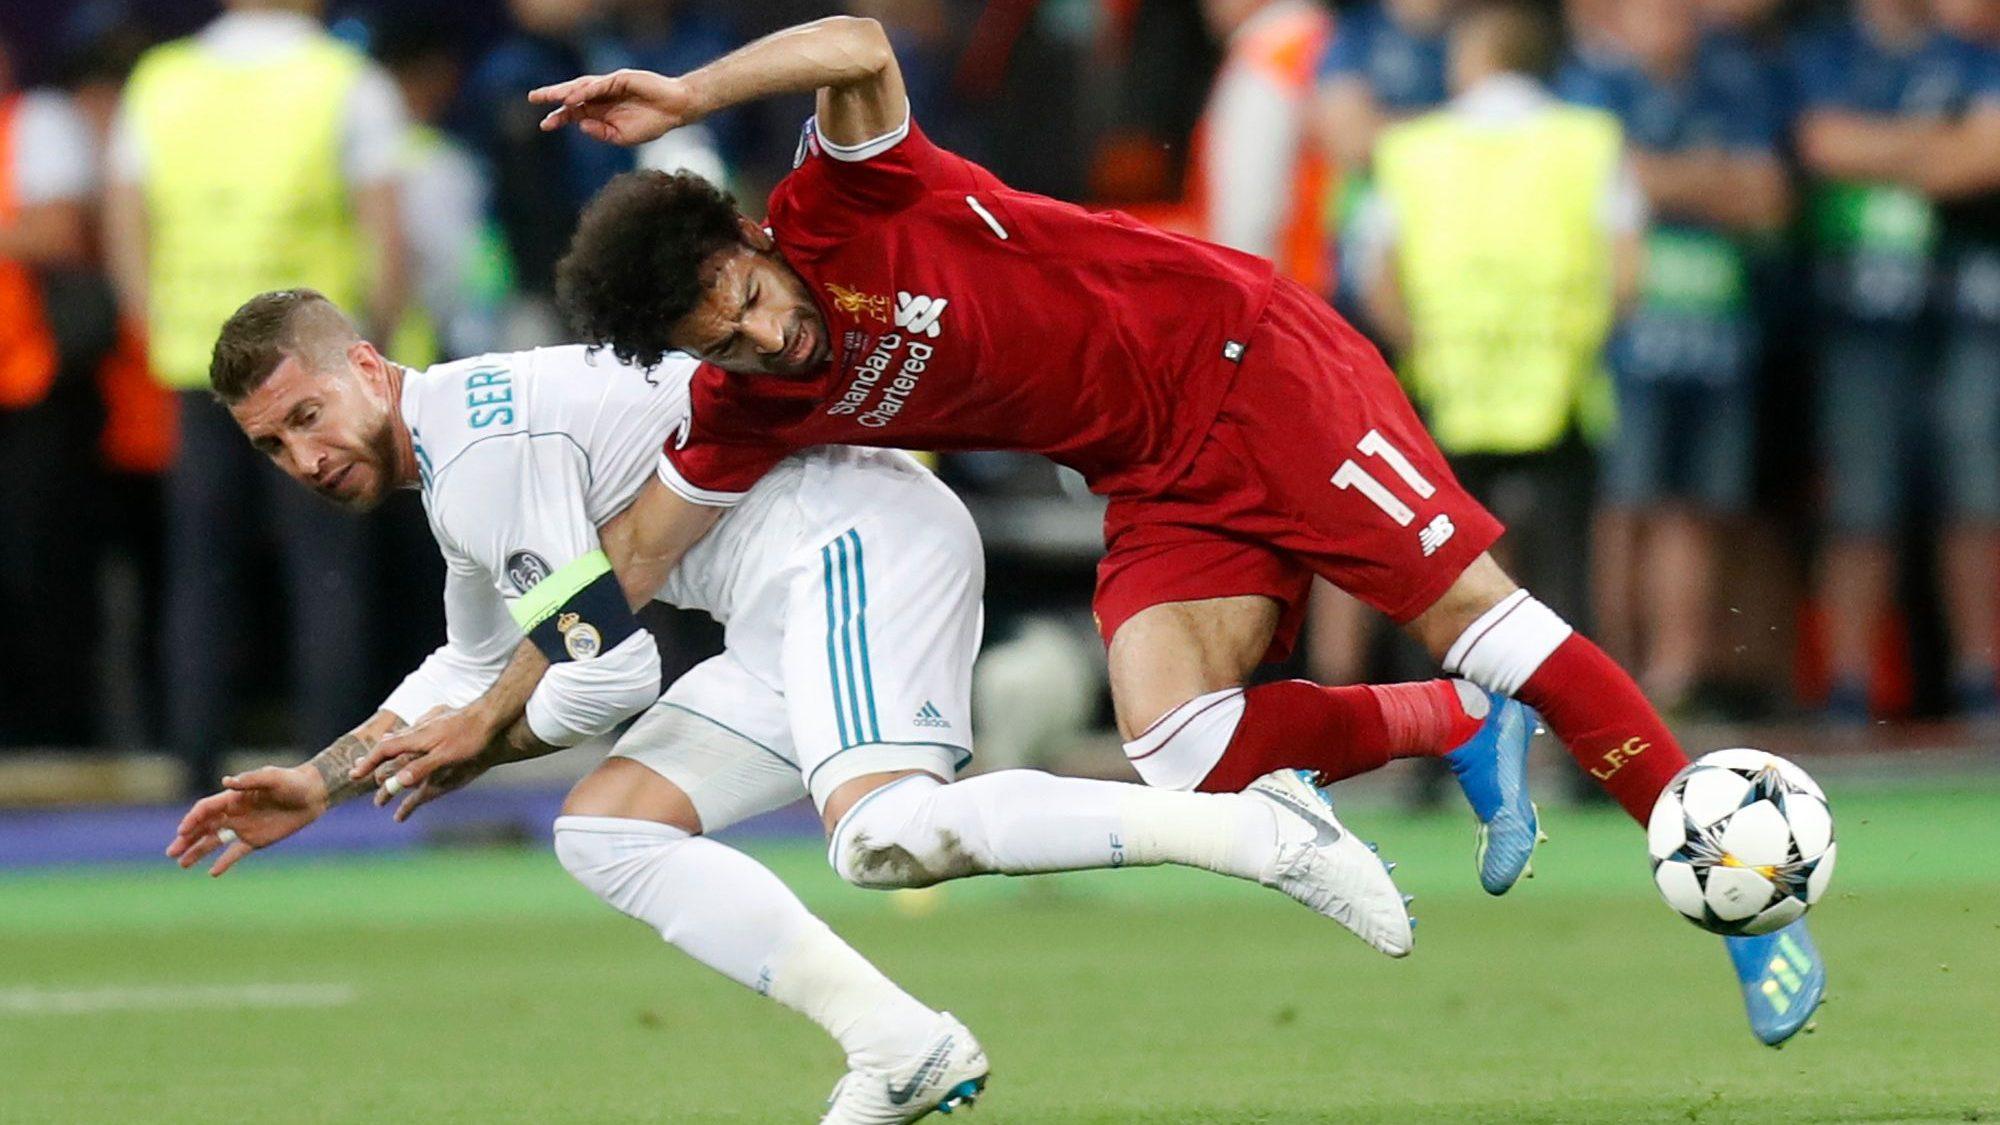 Salah's shoulder injury may miss the world cup